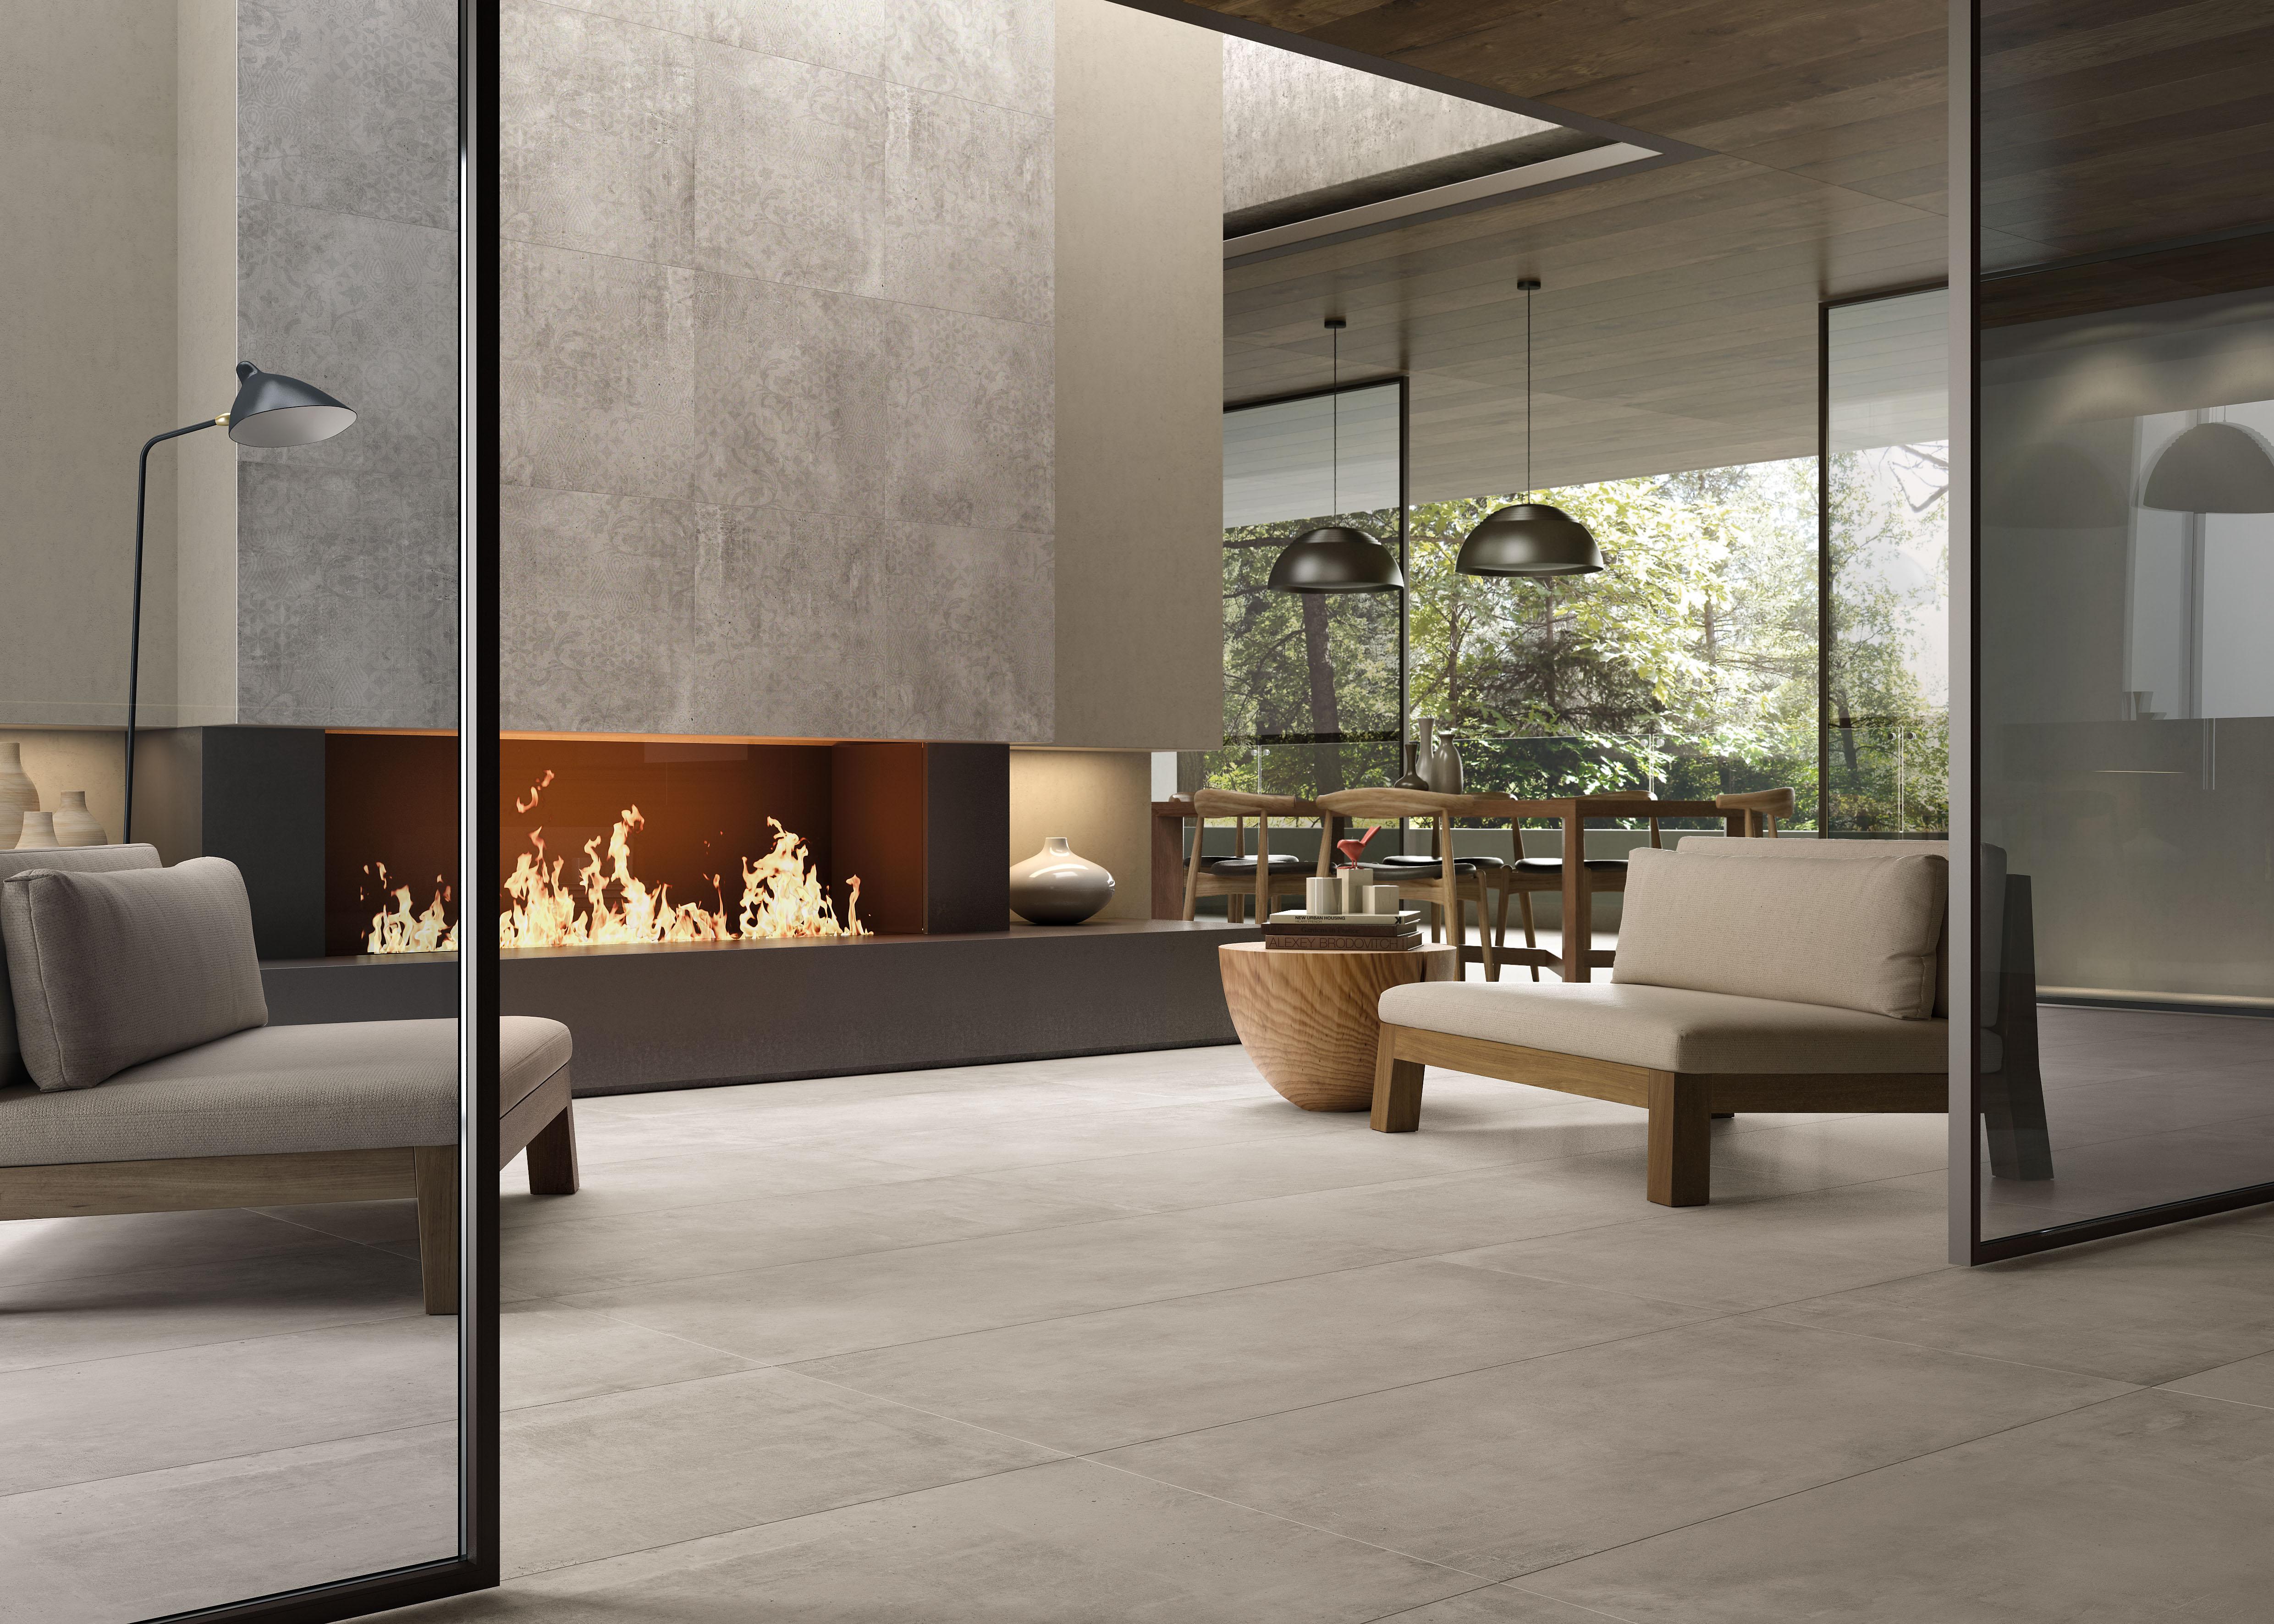 Ivory Betonfliesen im Wohnzimmer, ivory concrete effect tiles in living room